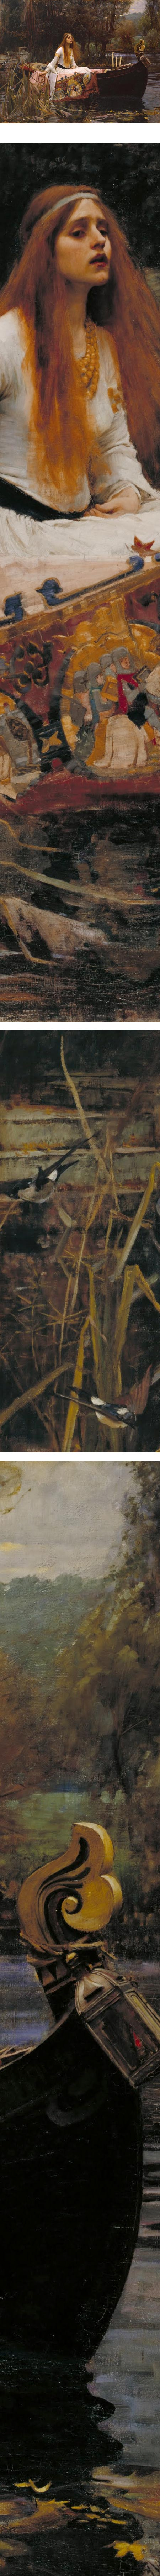 The Lady of Shalott, John William Waterhouse